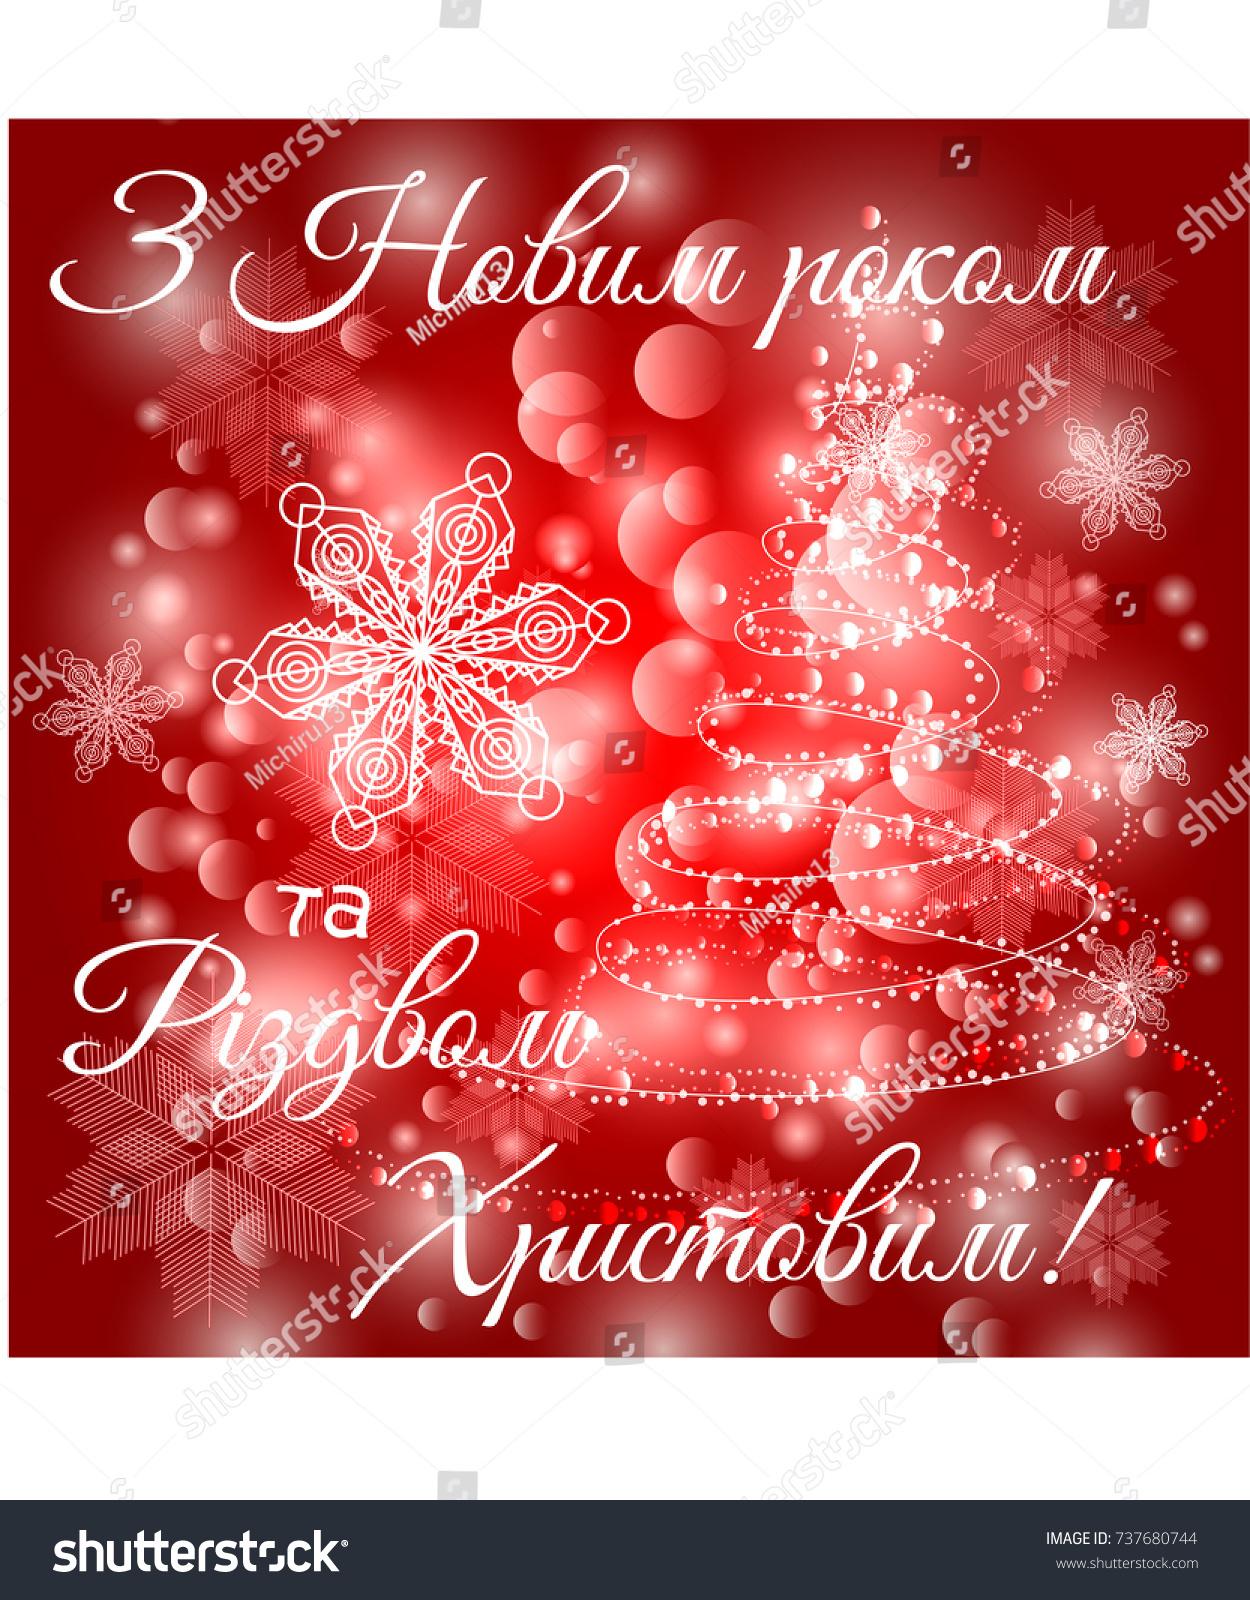 Inscription ukrainian happy new year merry stock vector 737680744 inscription ukrainian happy new year merry stock vector 737680744 shutterstock m4hsunfo